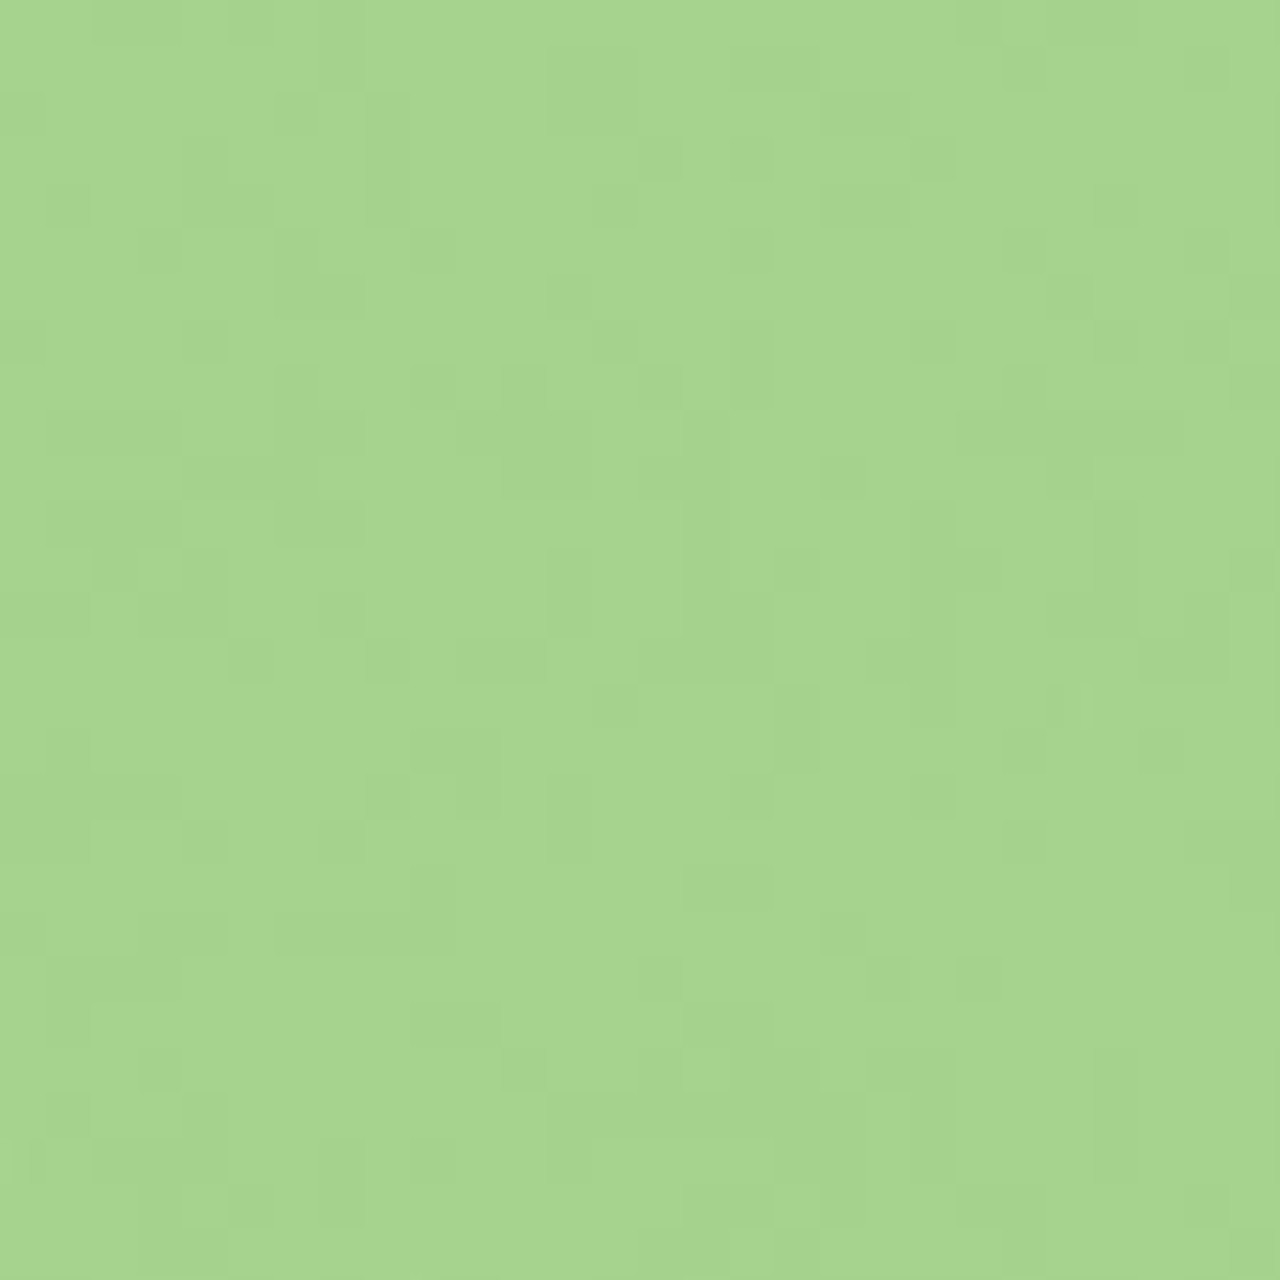 "#0088 Rosco Gels Roscolux Light Green, 20x24"""